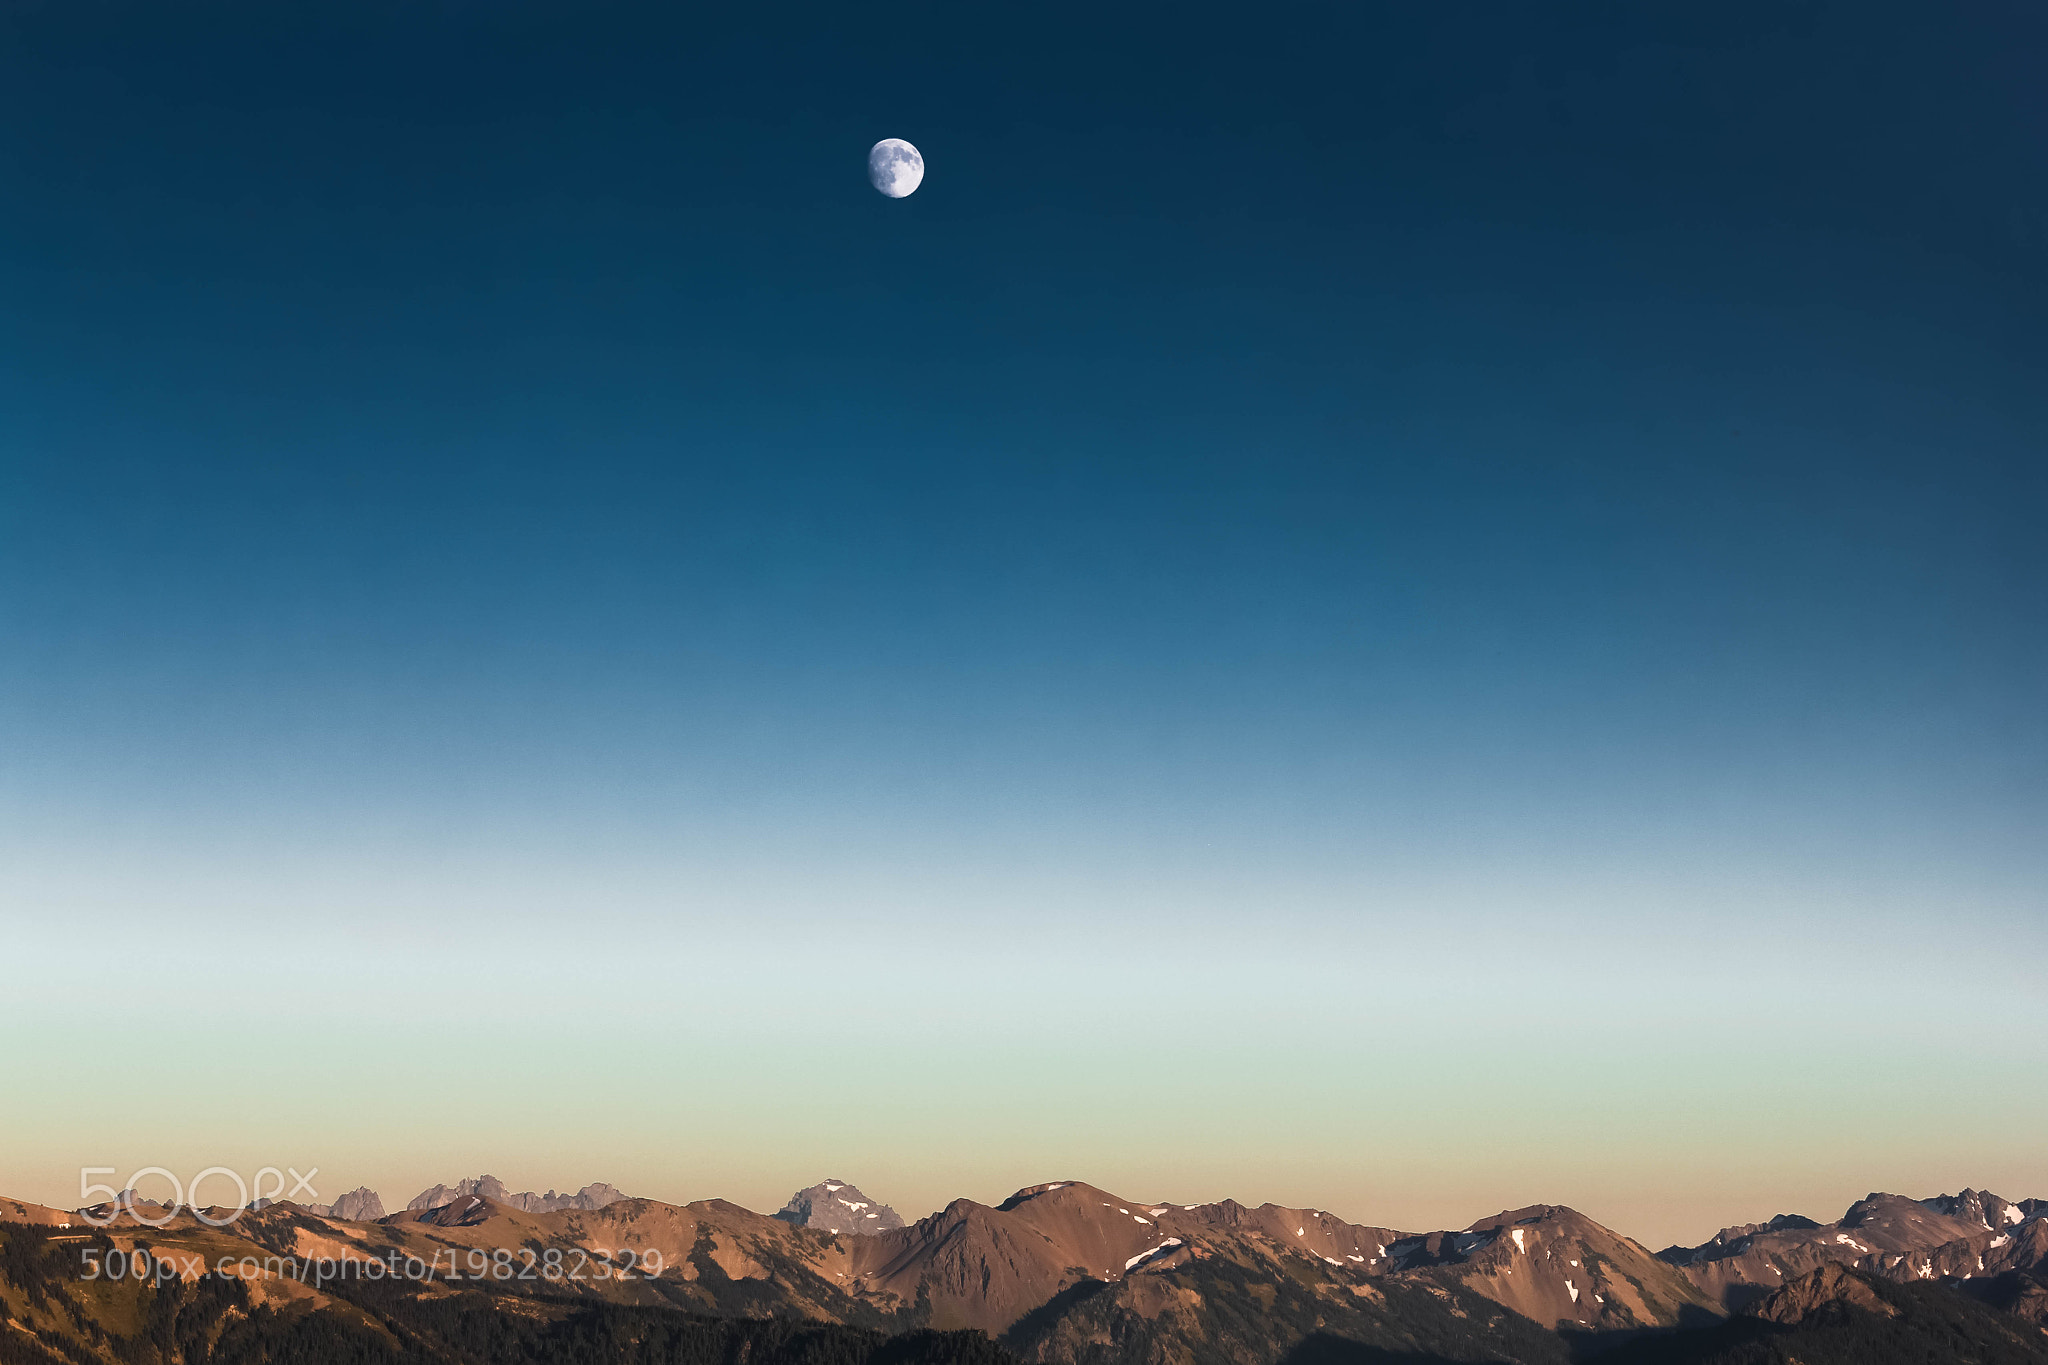 Moonscape – Olympic Peninsula, USA